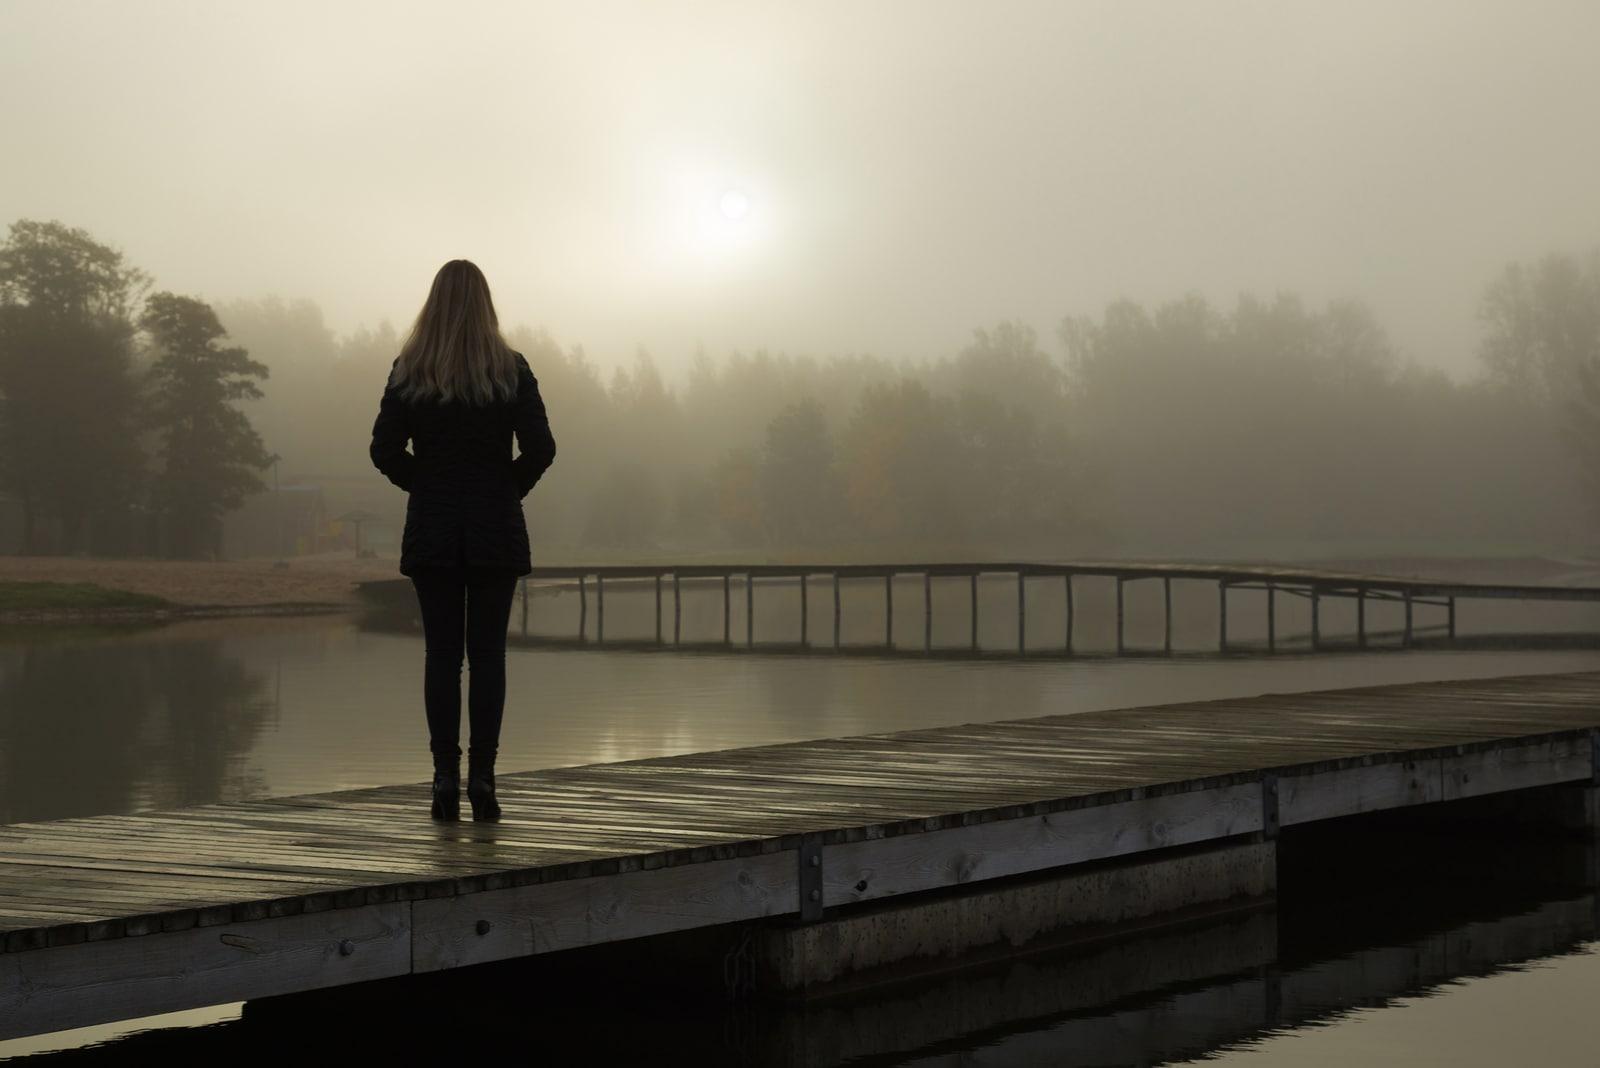 woman standing alone on lake footbridge